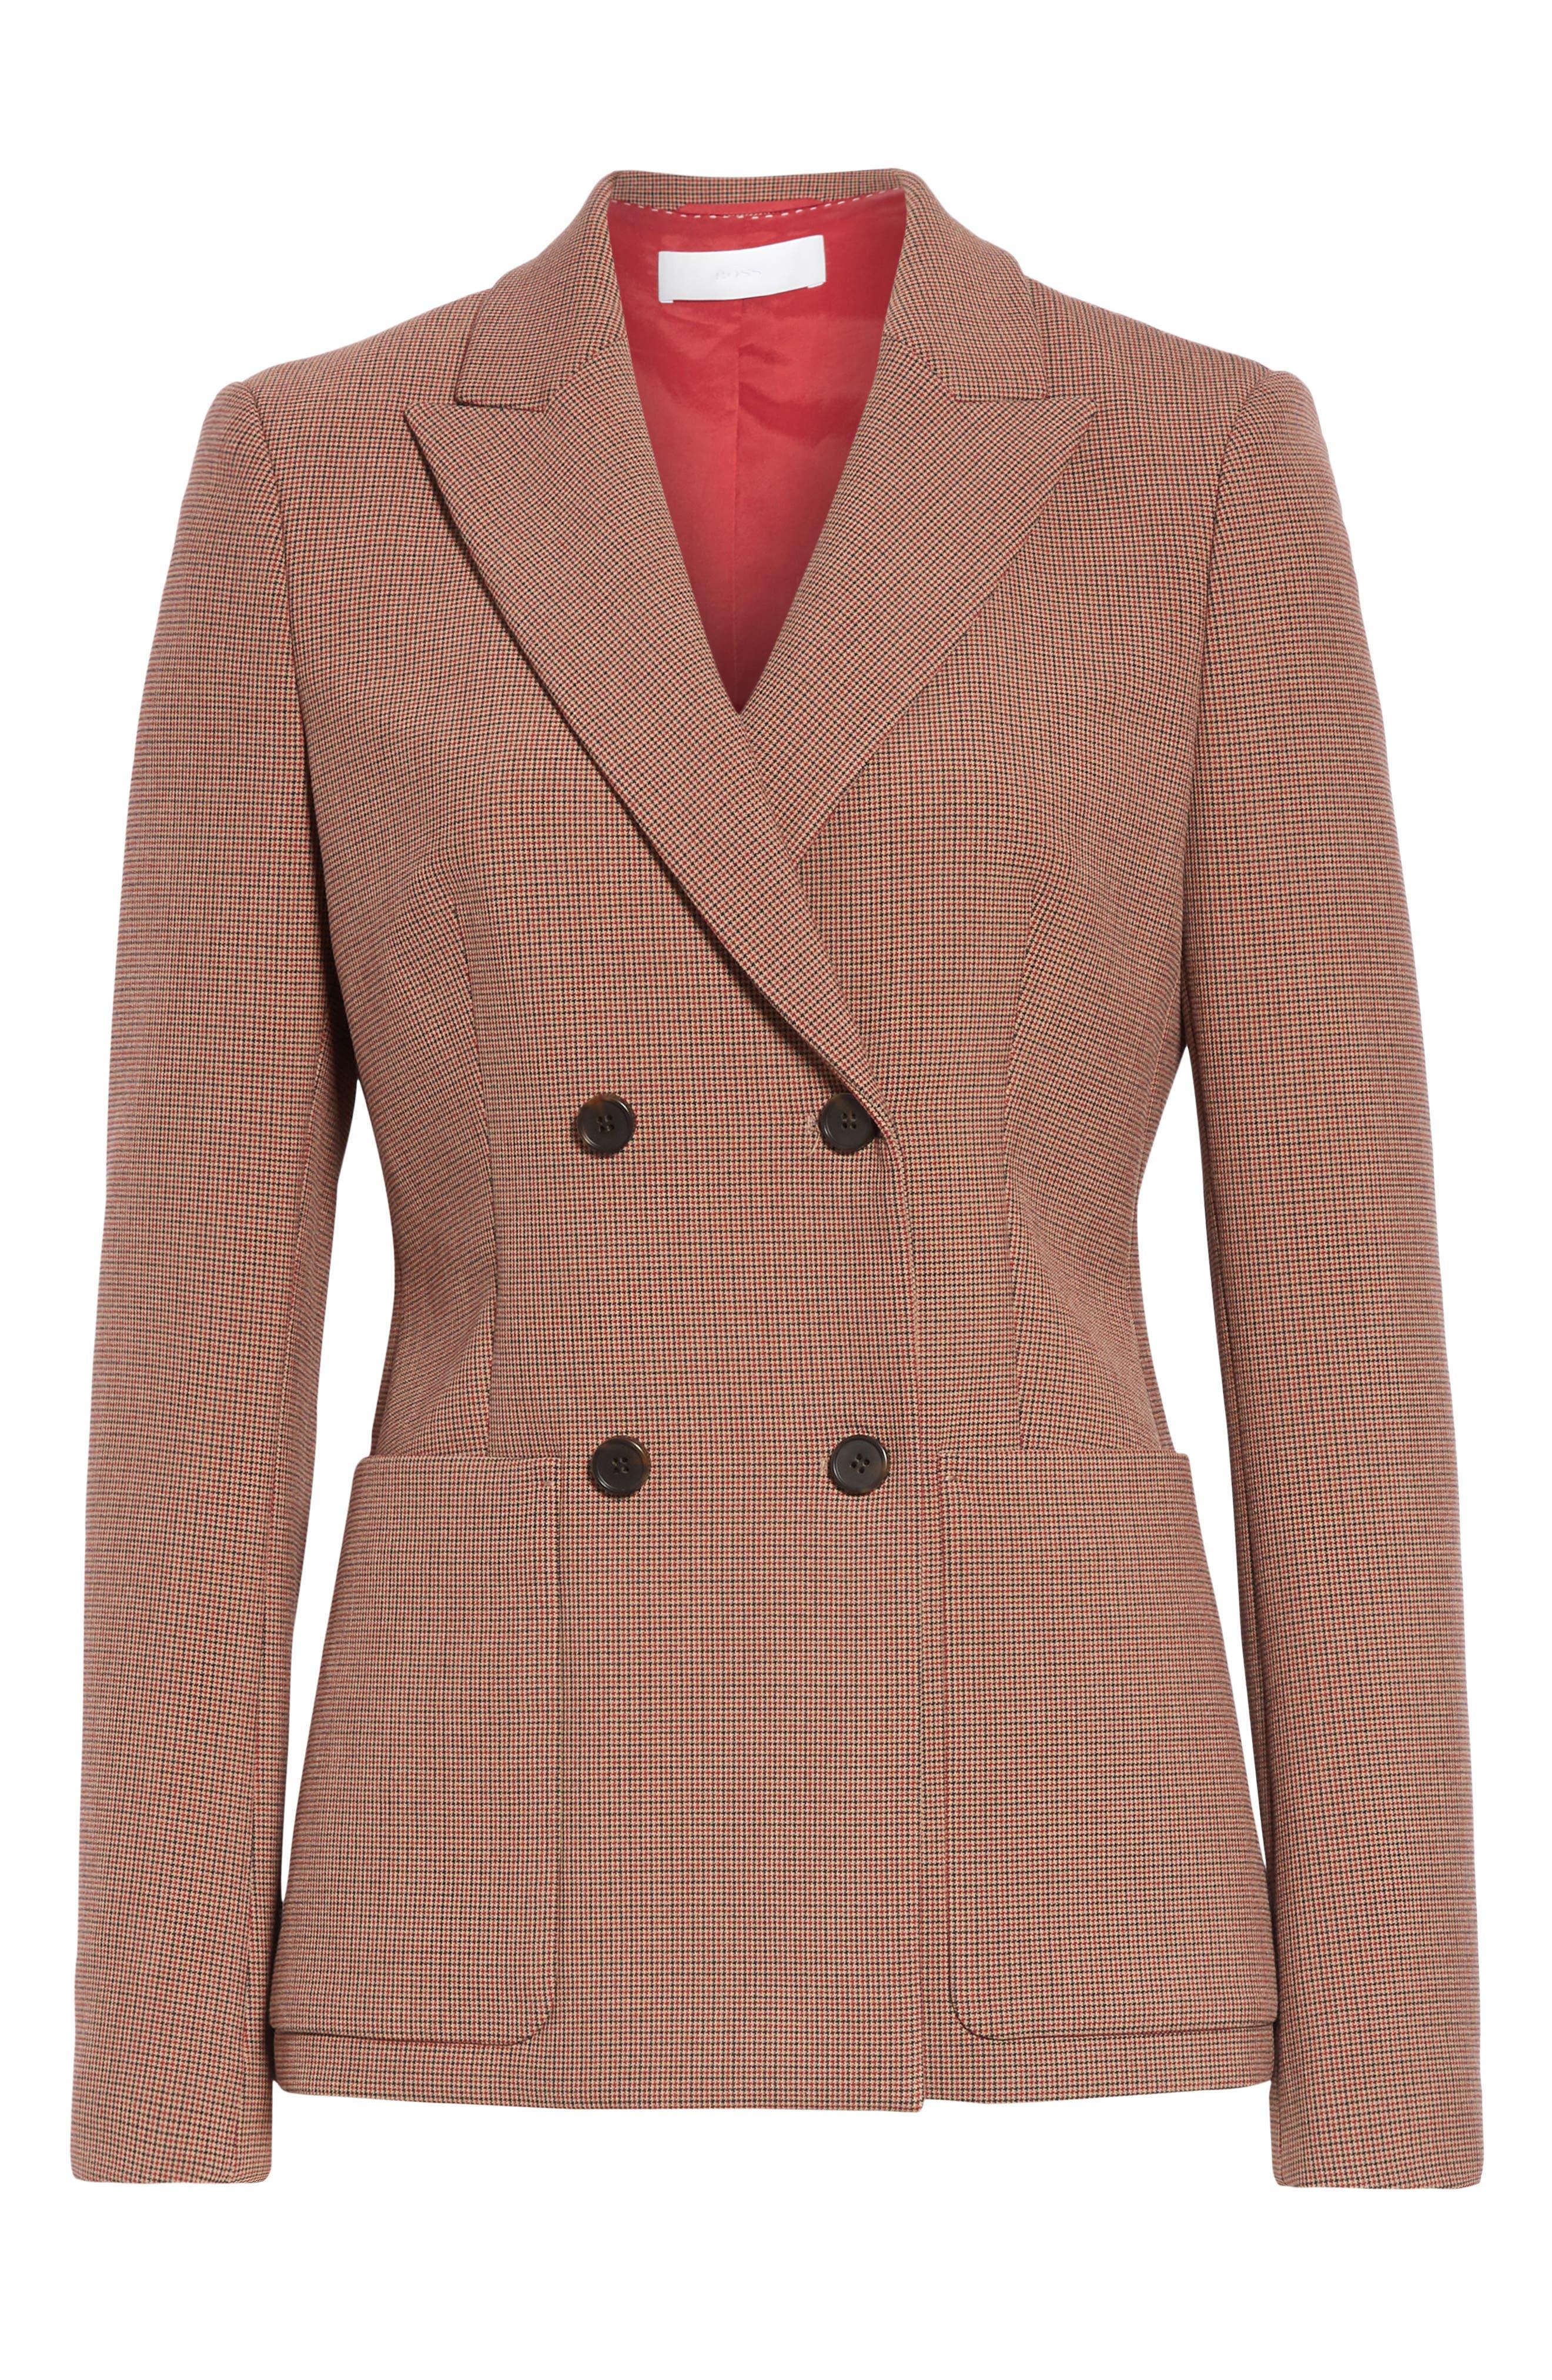 Joliviena Check Suit Jacket,                             Alternate thumbnail 5, color,                             DARK RED CHECK